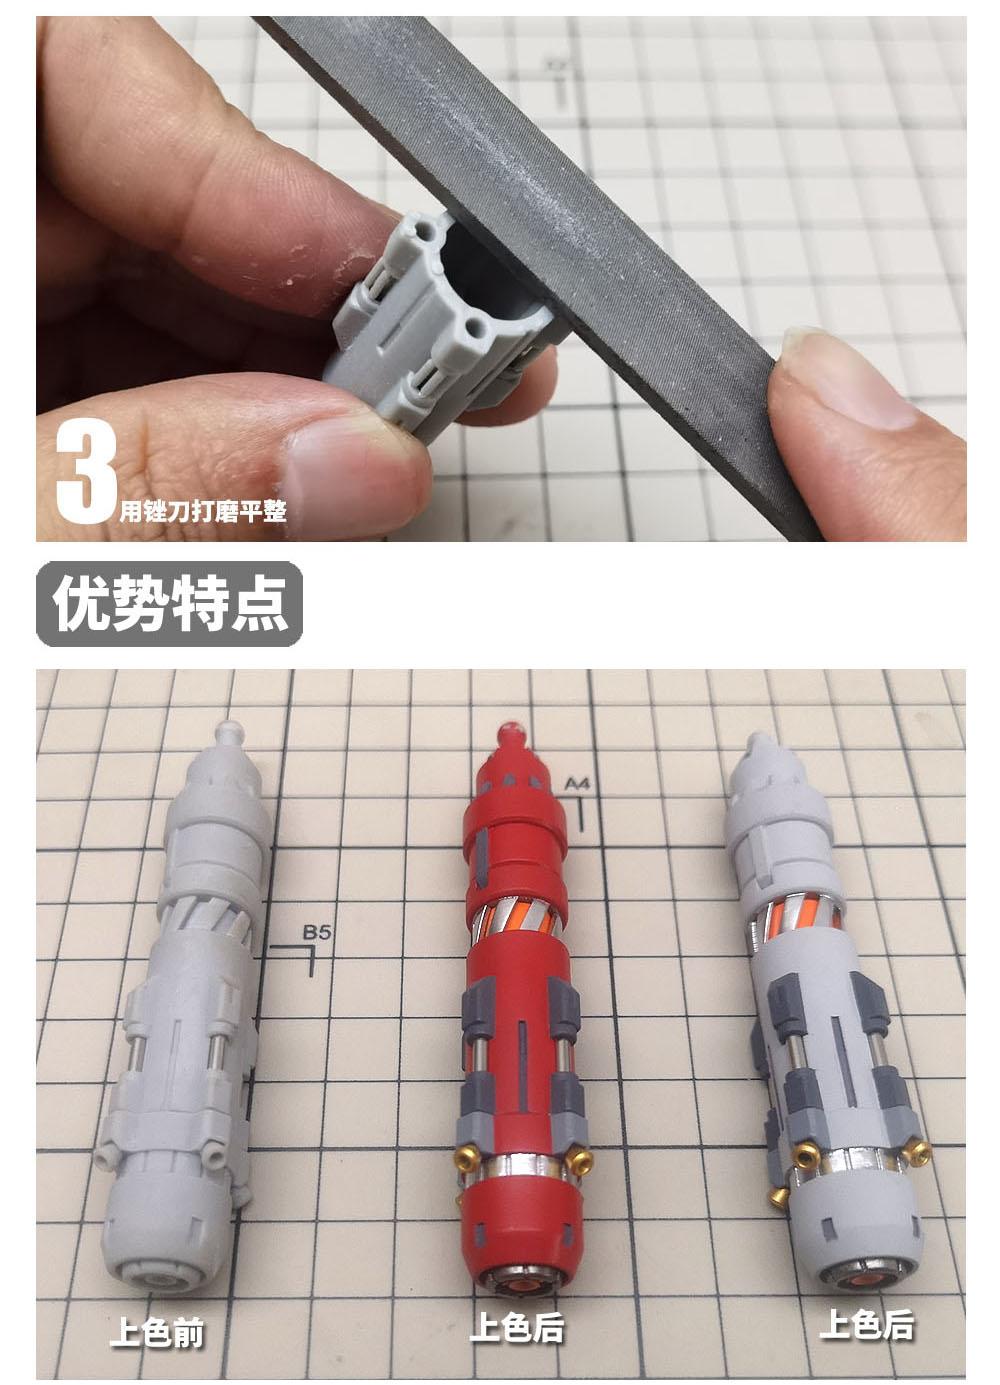 G829_HS018RG_Propeller_tank_005.jpg